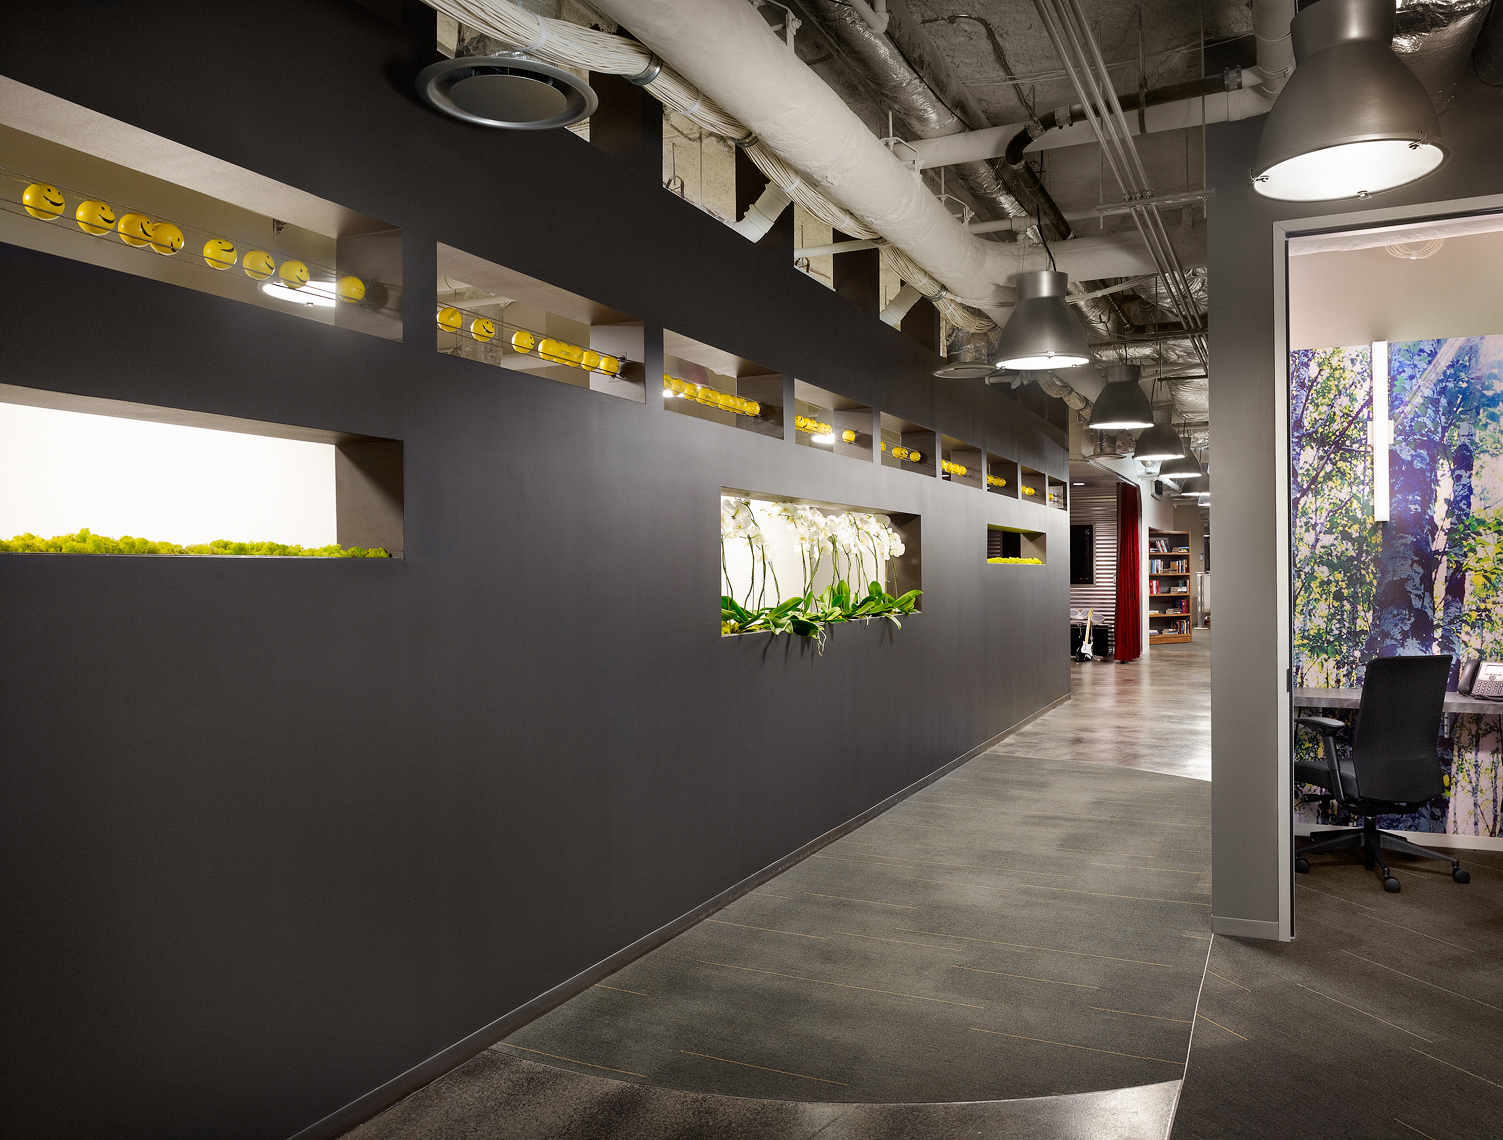 hallway_alt.noballs.jpg